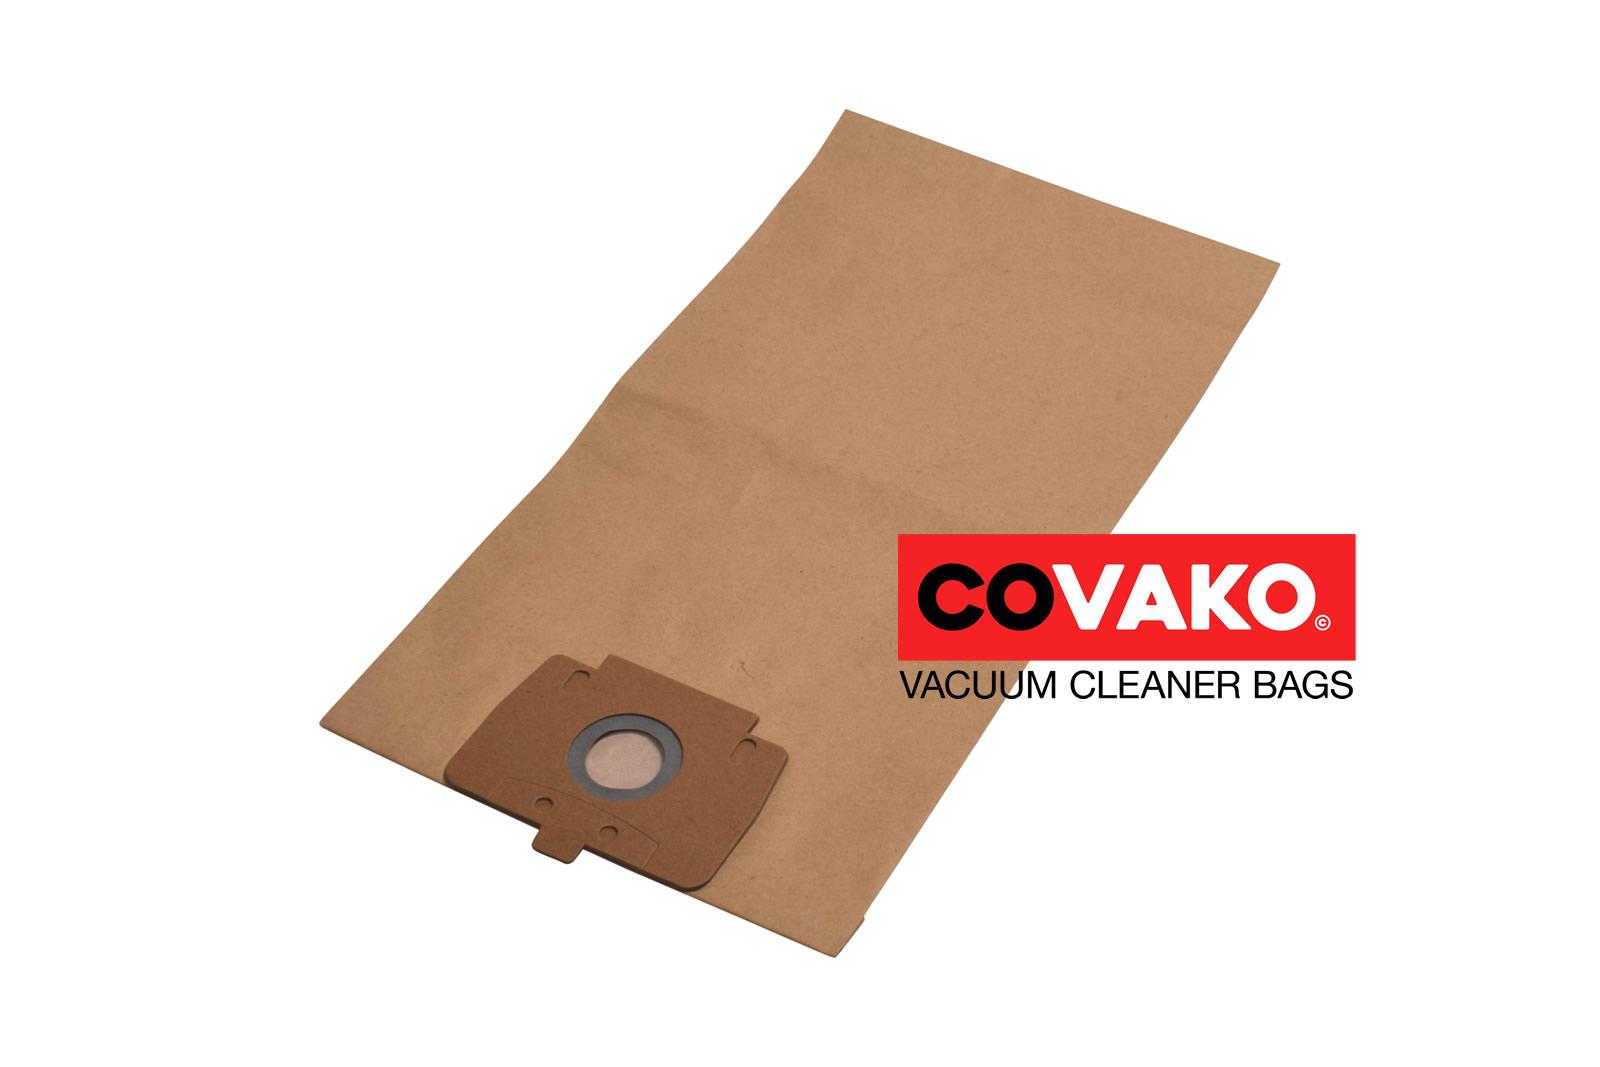 Hako Supervac 100 / Papier - Hako Staubsaugerbeutel